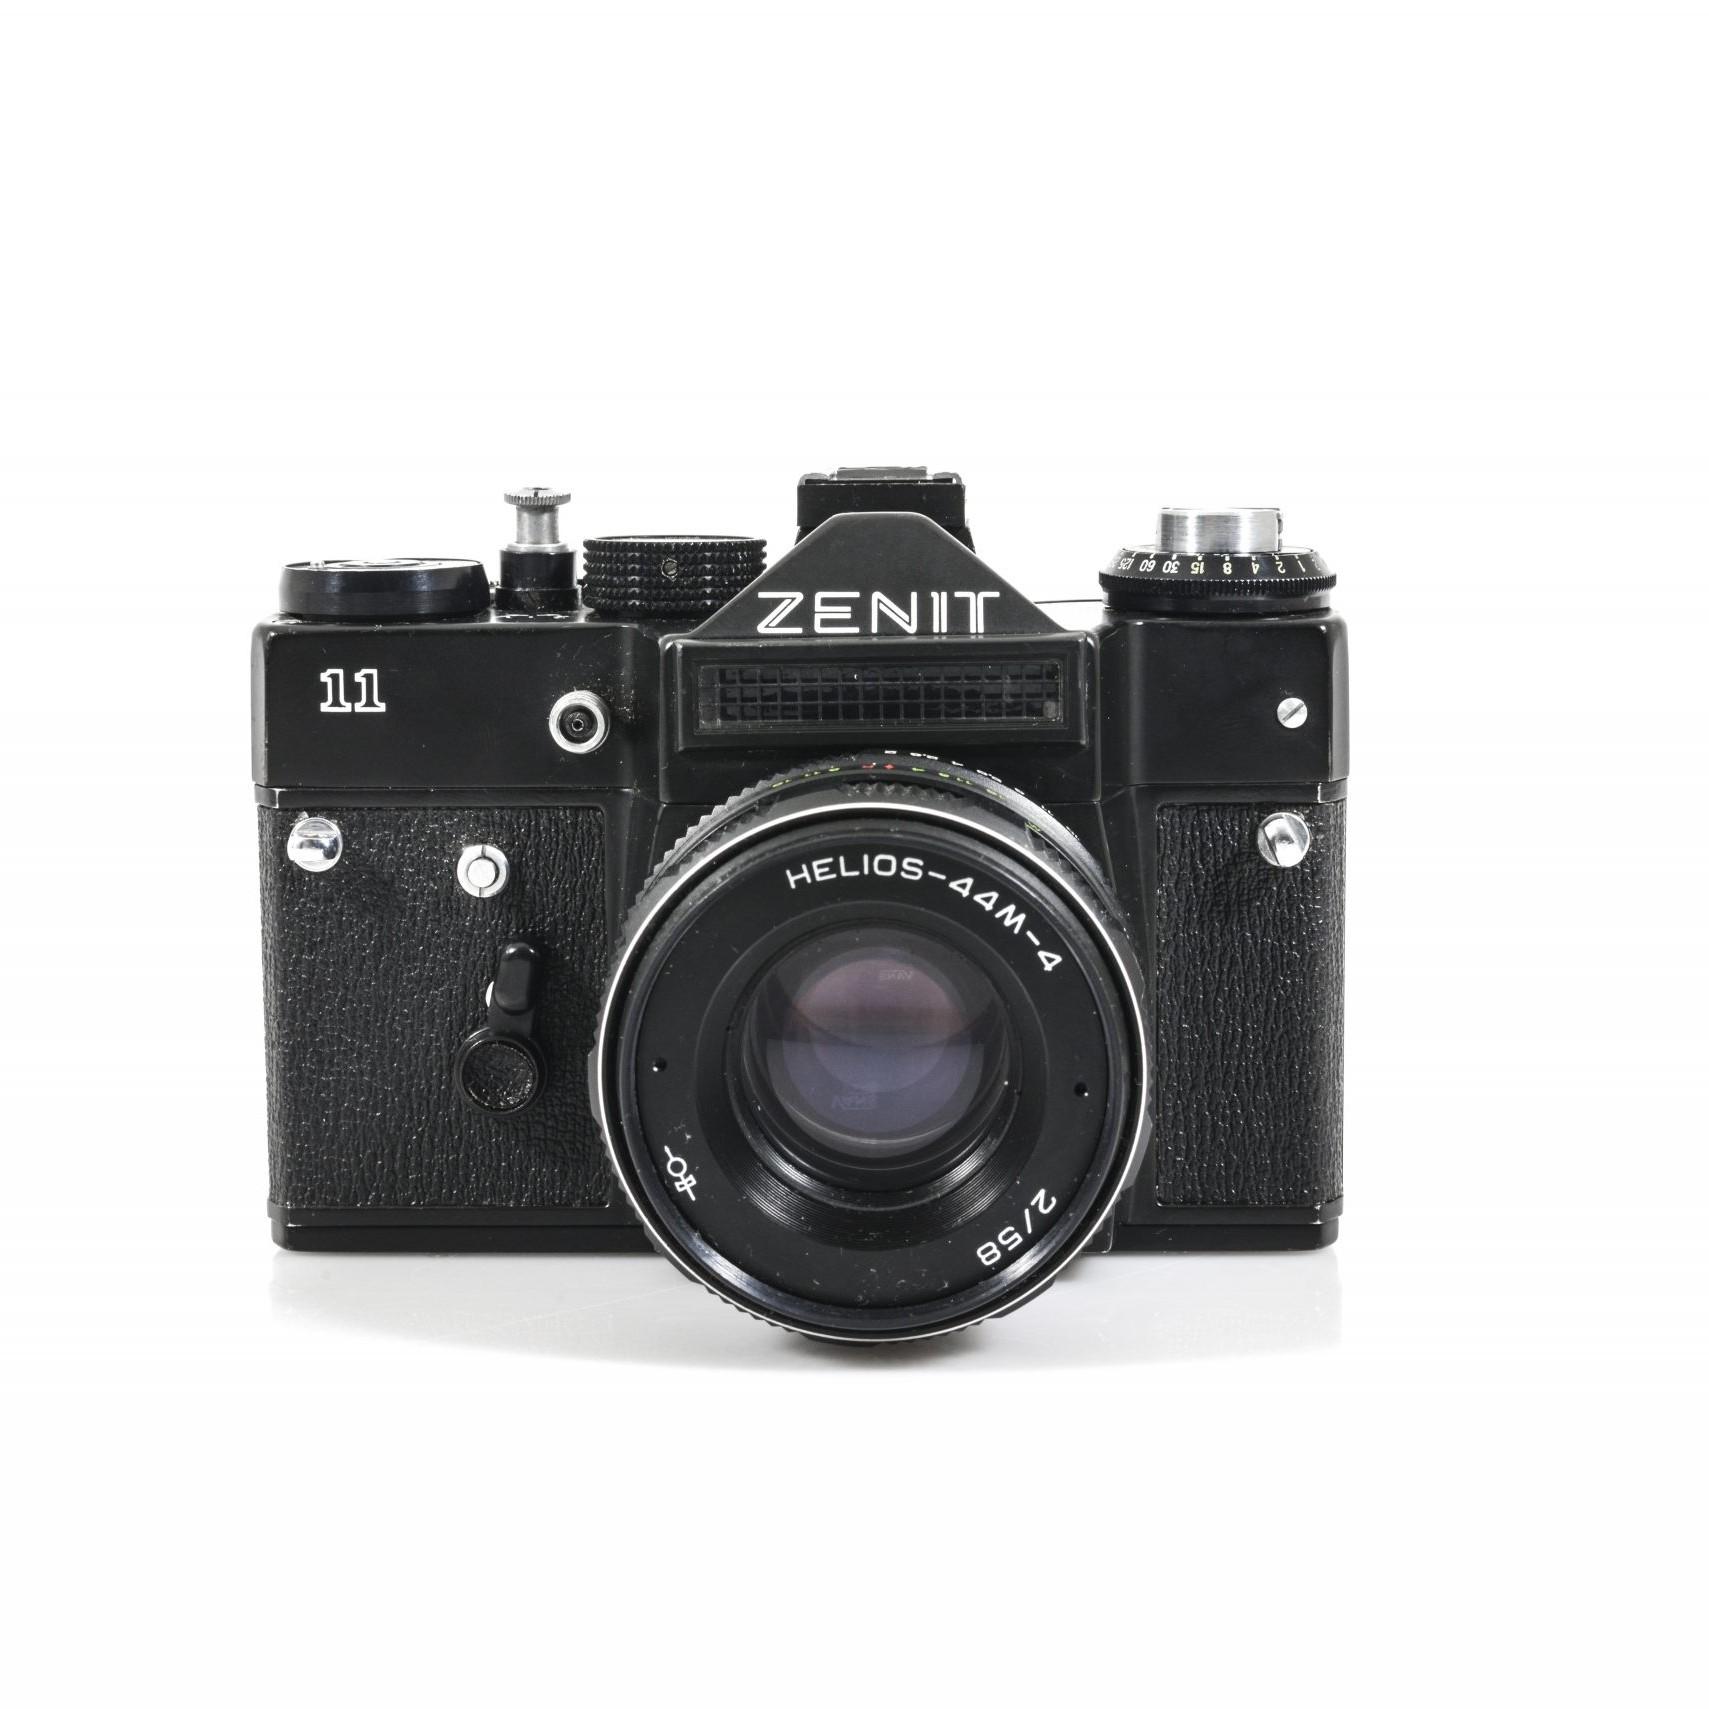 Gorgeous Zenit 11 35mm Film Camera + Helios 44m F2 Lens